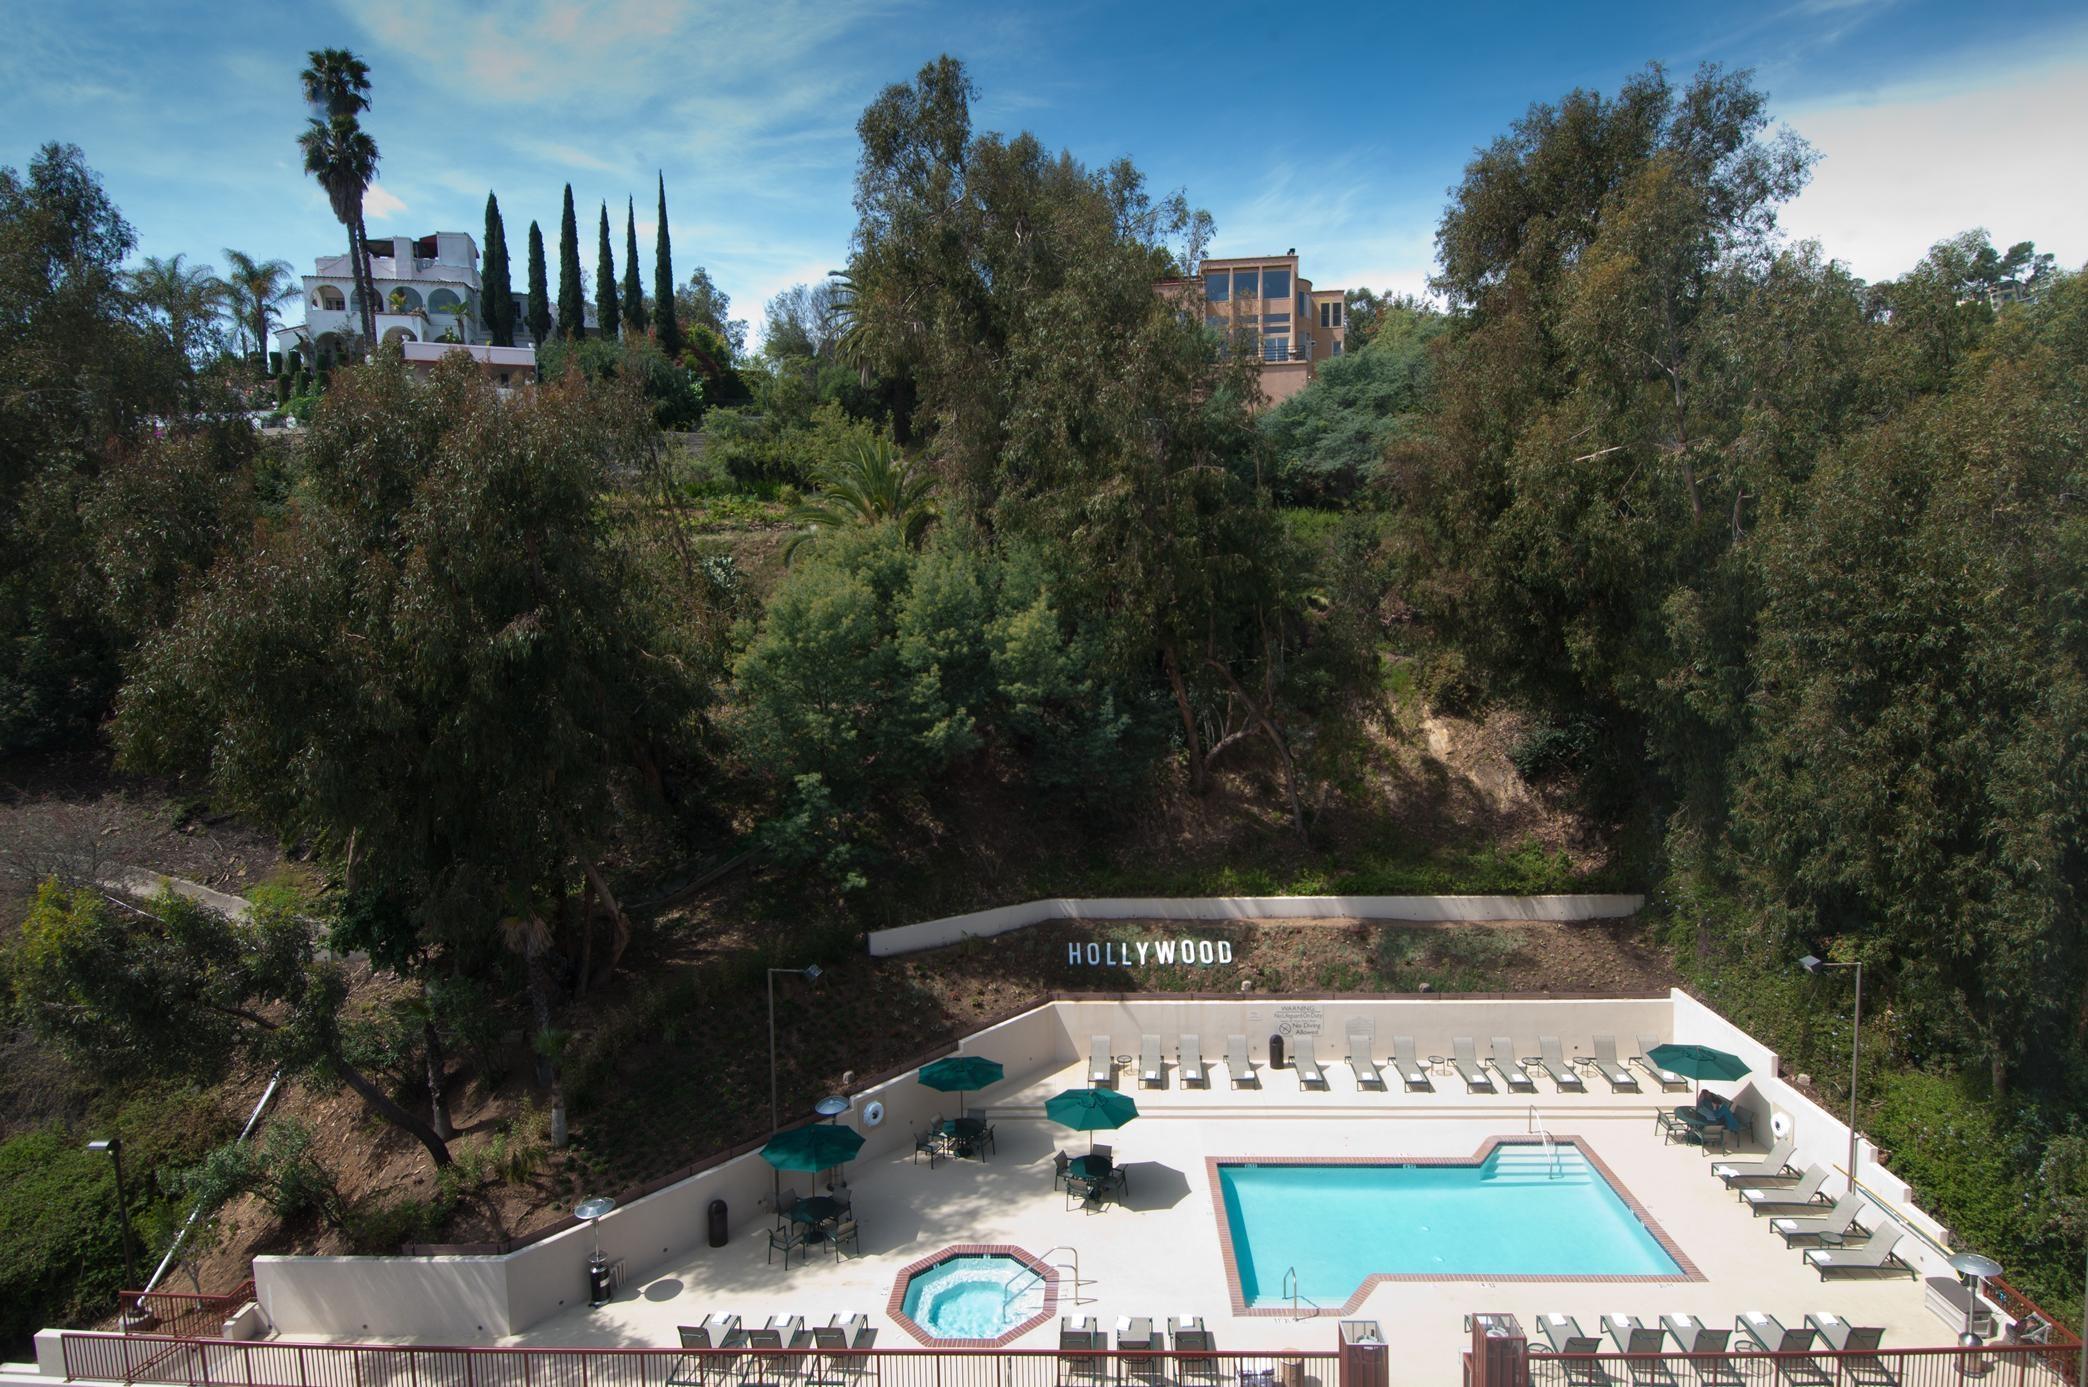 Hilton Garden Inn Los Angeles/Hollywood image 6